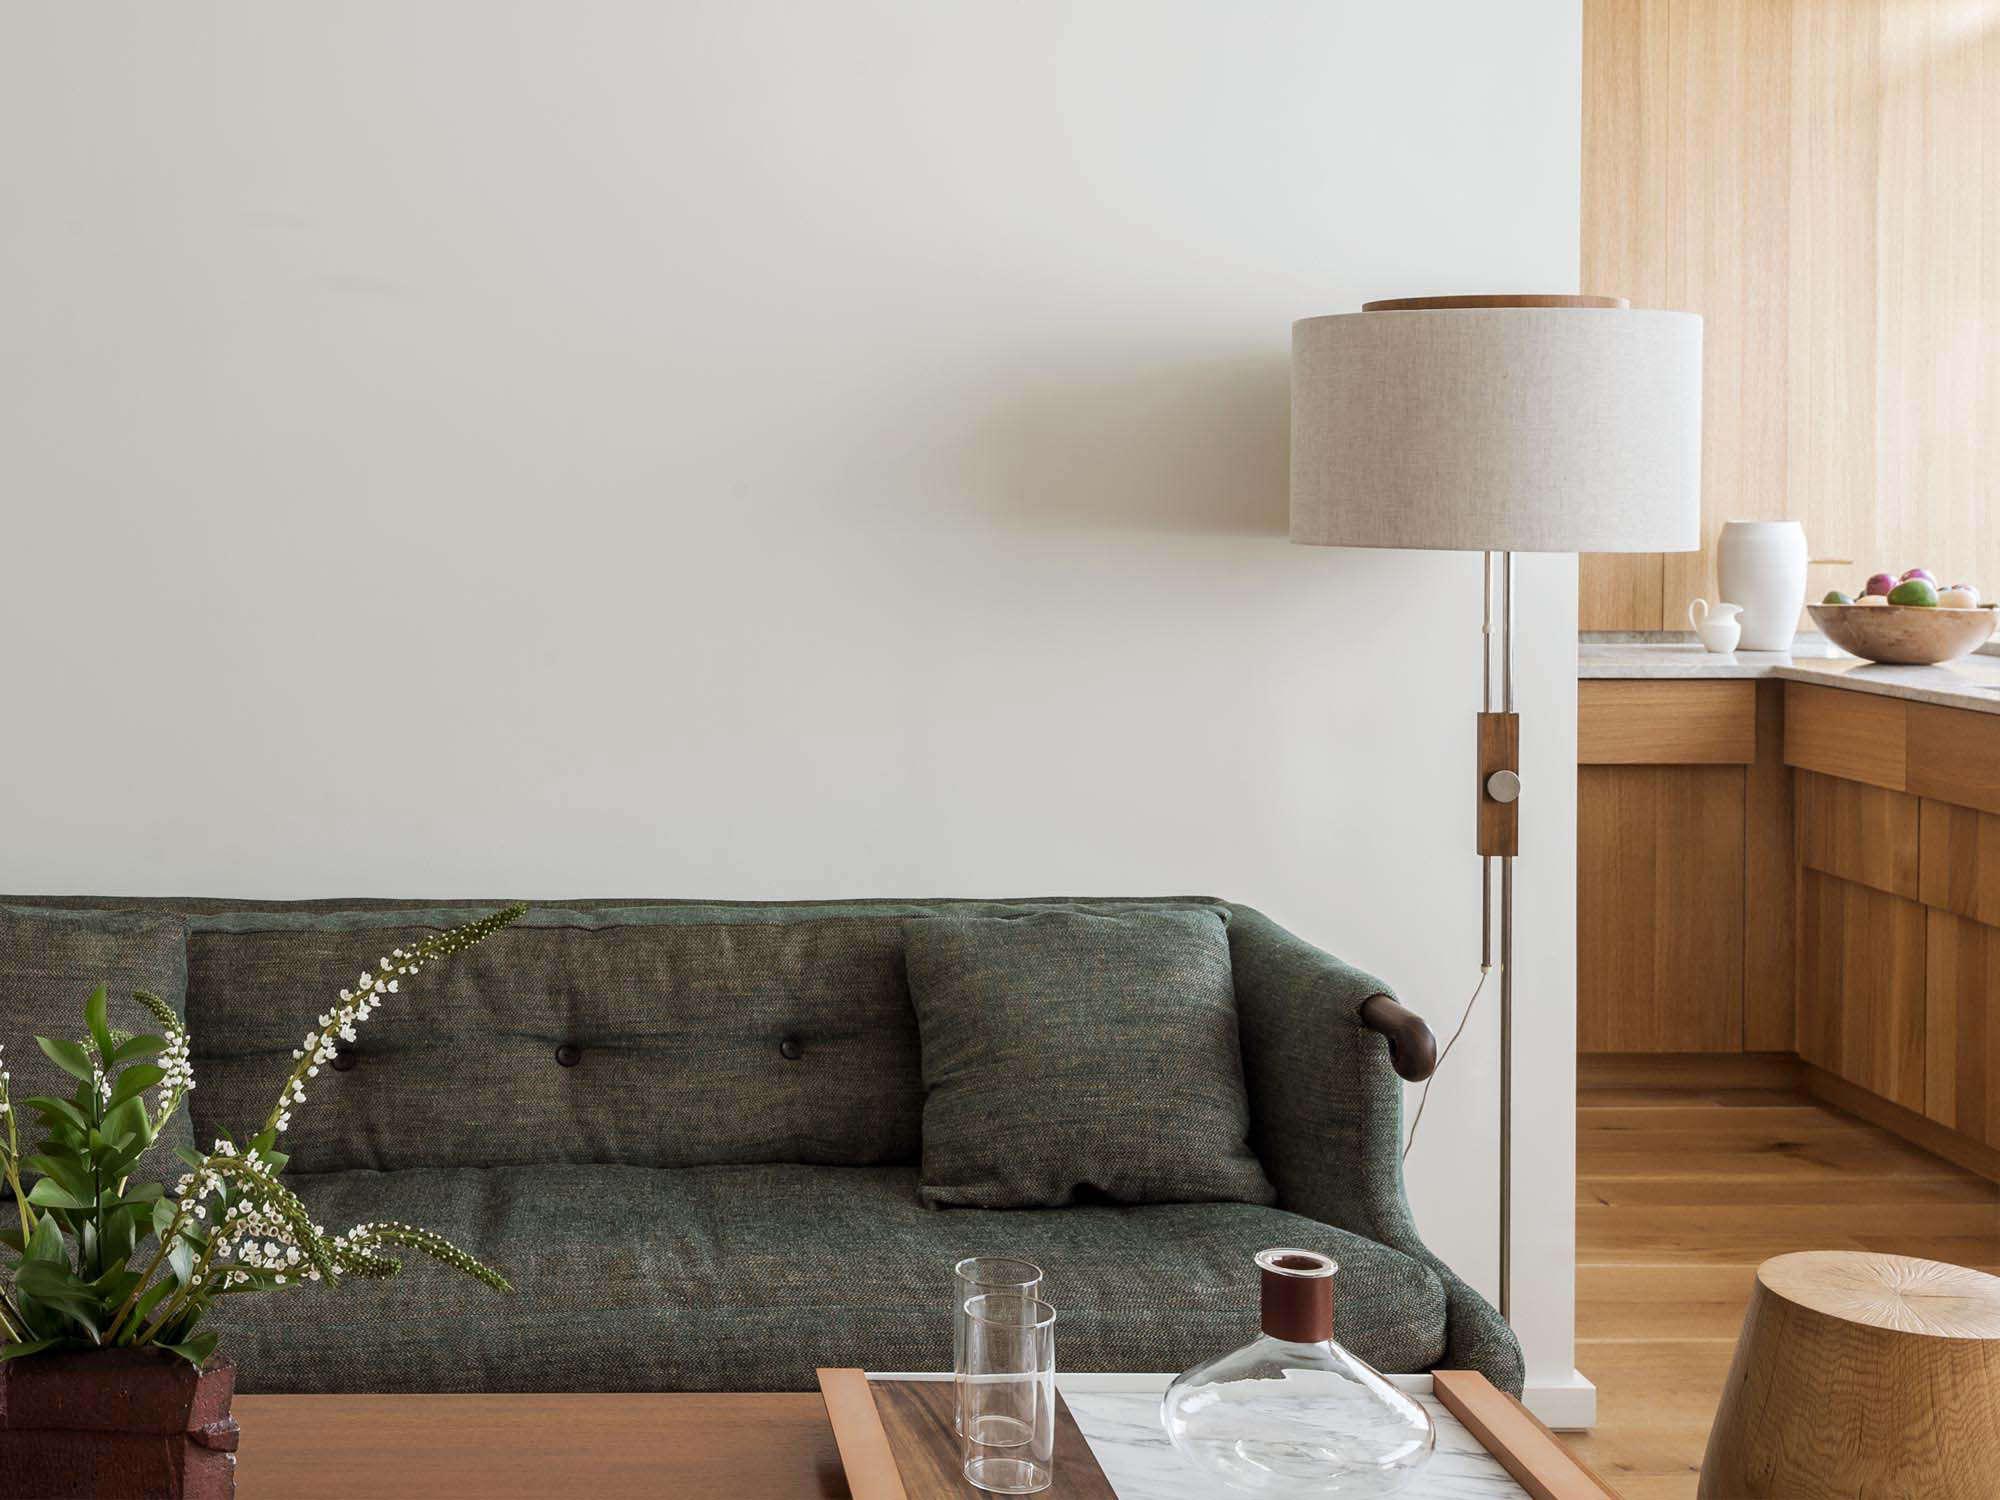 Workstead NYC one-bedroom remodel combined living room-kitchen with custom oak millwork, BDDW sofa, Matthew Williams photo